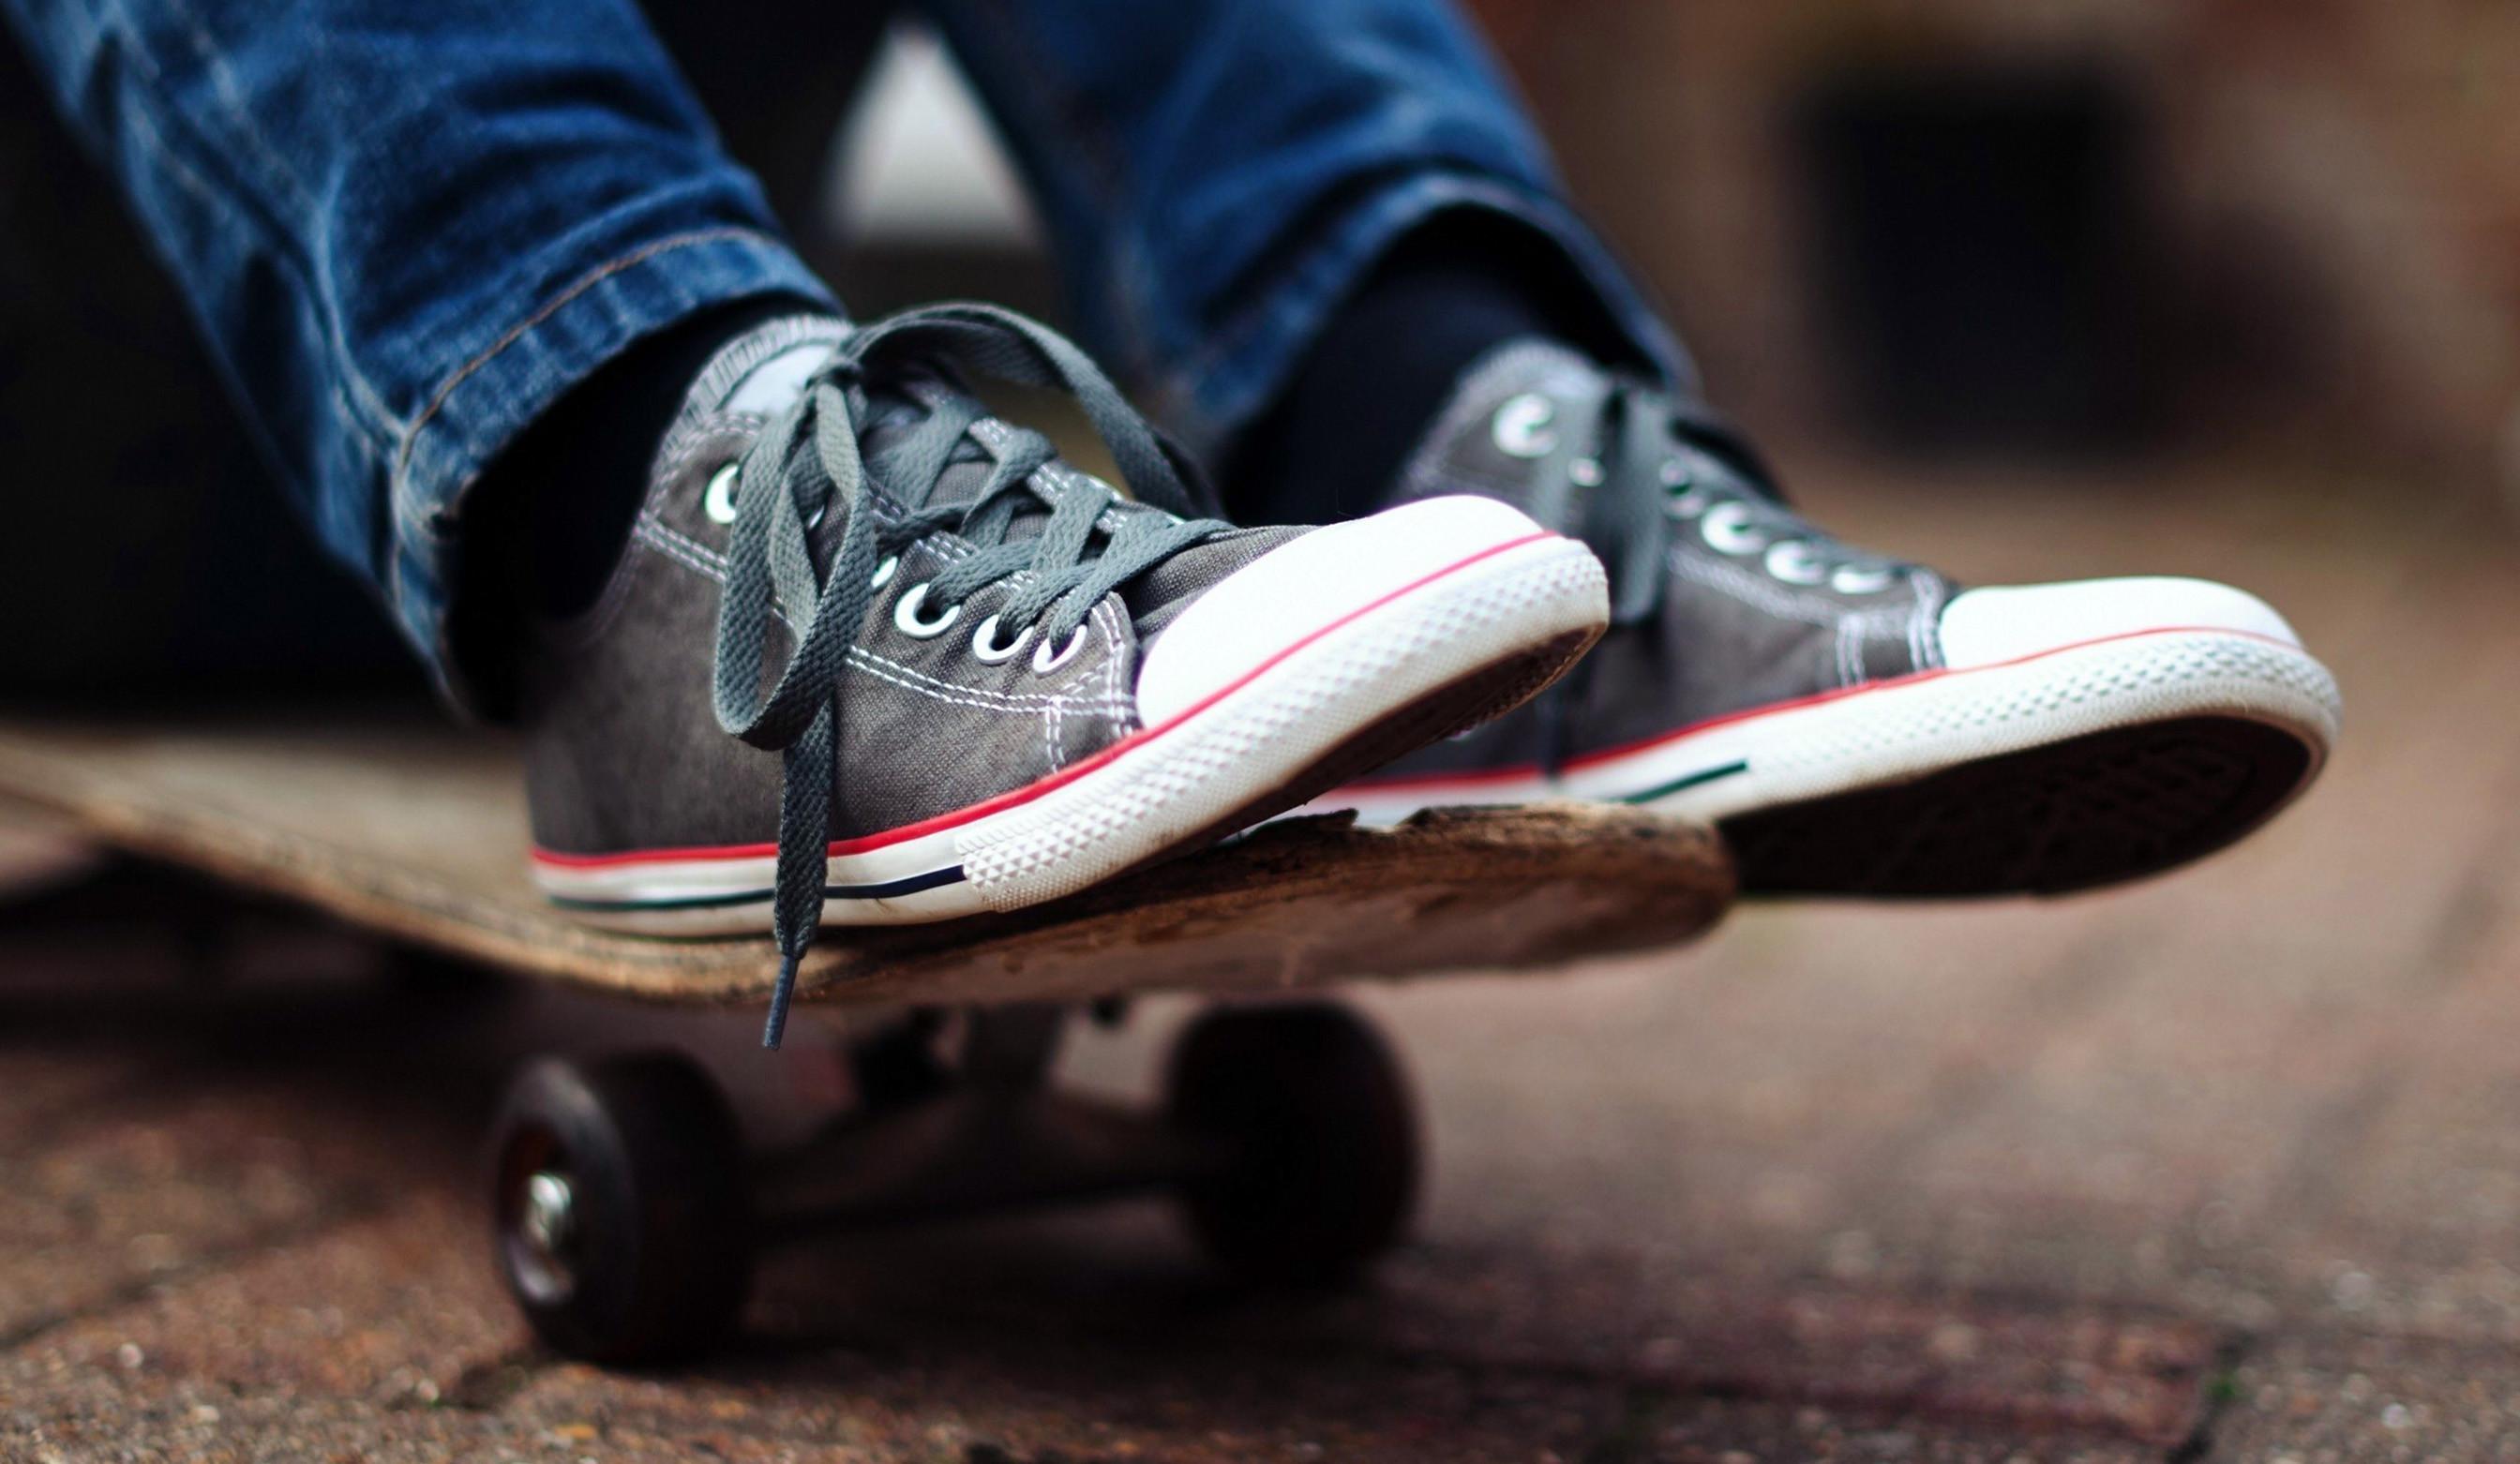 Cool skateboarding wallpapers 63 images 1920x1080 skateboarding wallpaper hd free download voltagebd Choice Image